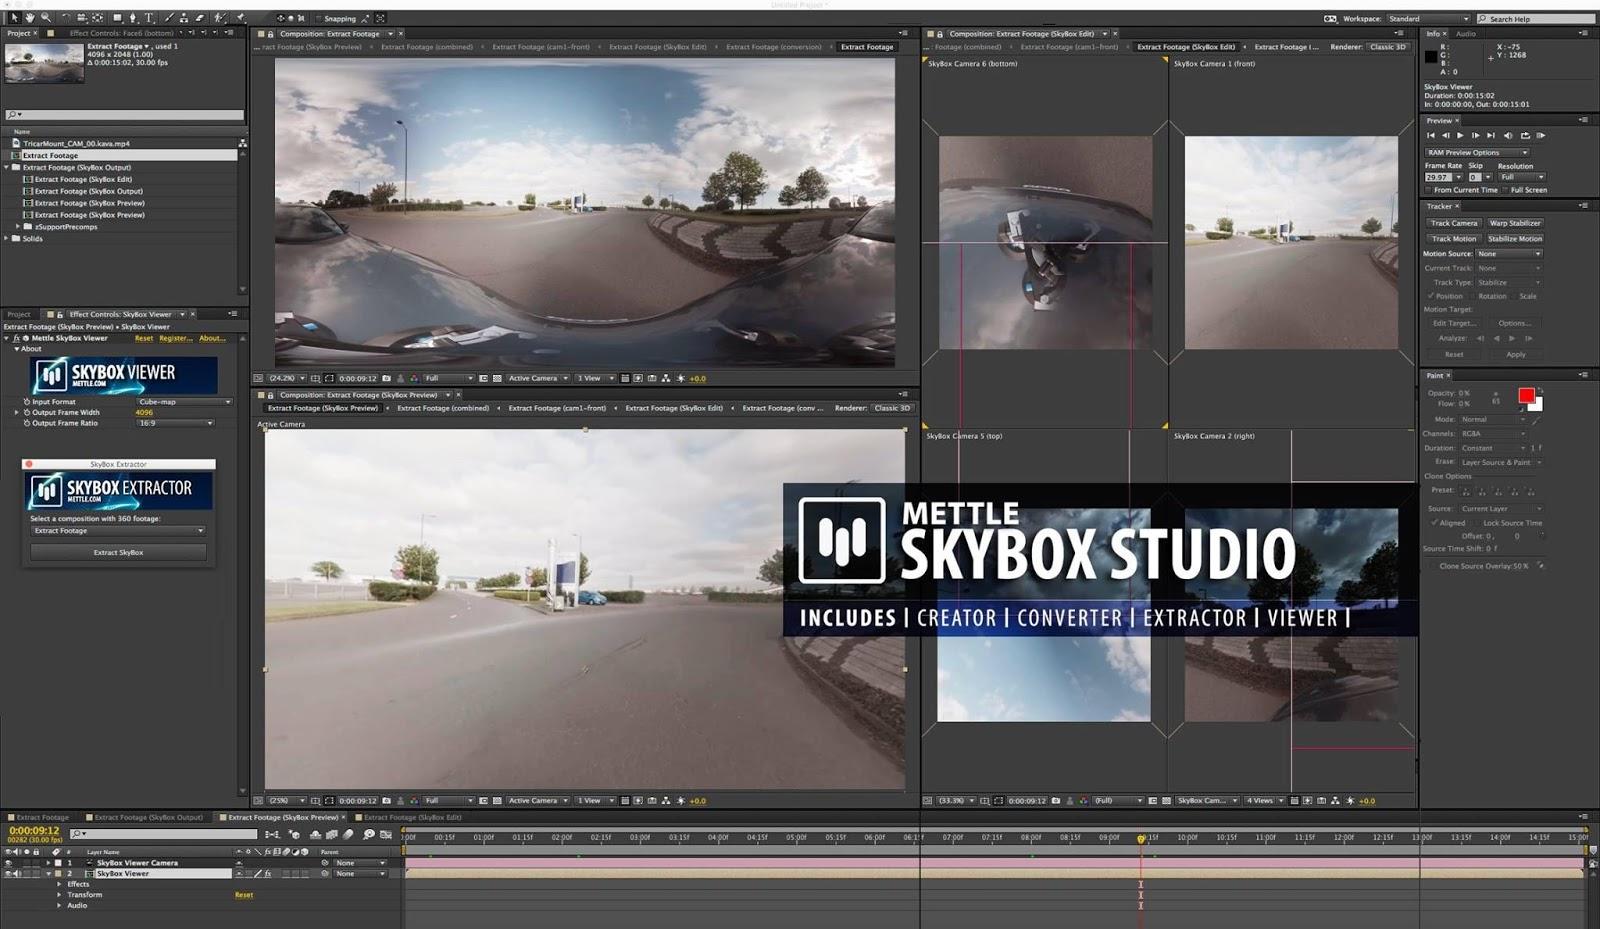 IT Việt Nam: Mettle SkyBox Studio v2 61 Free Download | 360